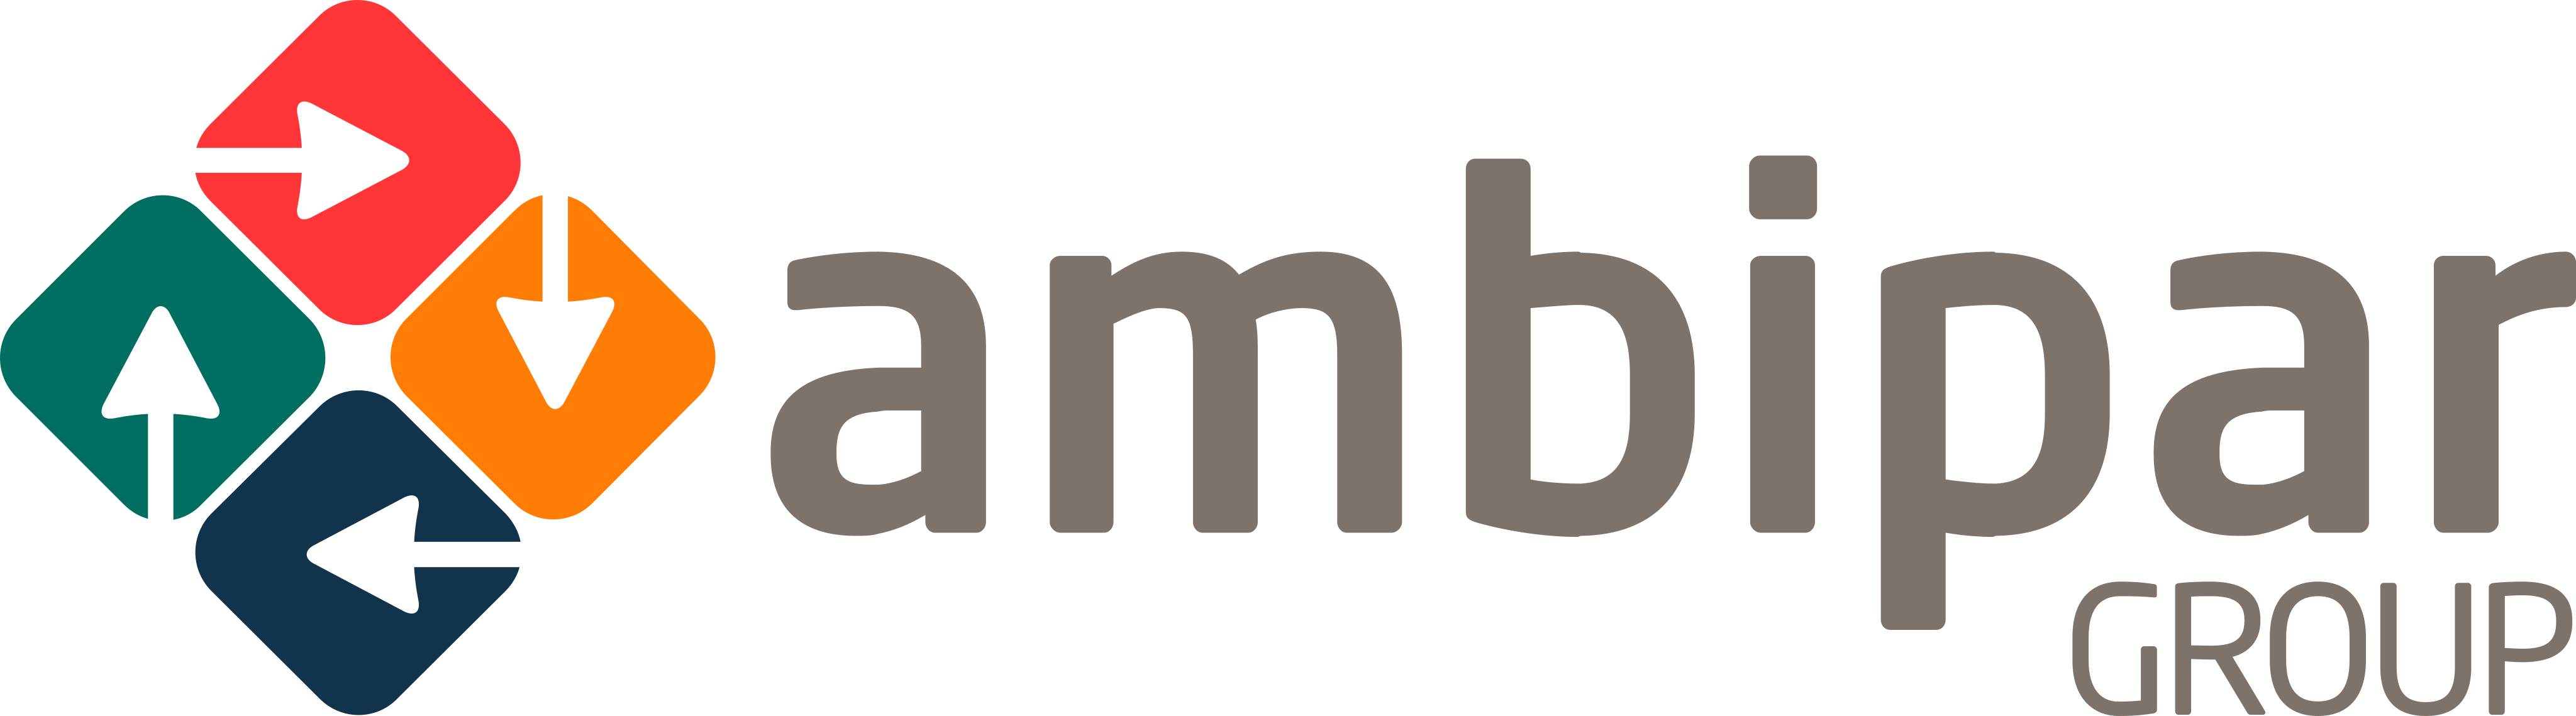 ambipar logo - Ambipar Group Logo